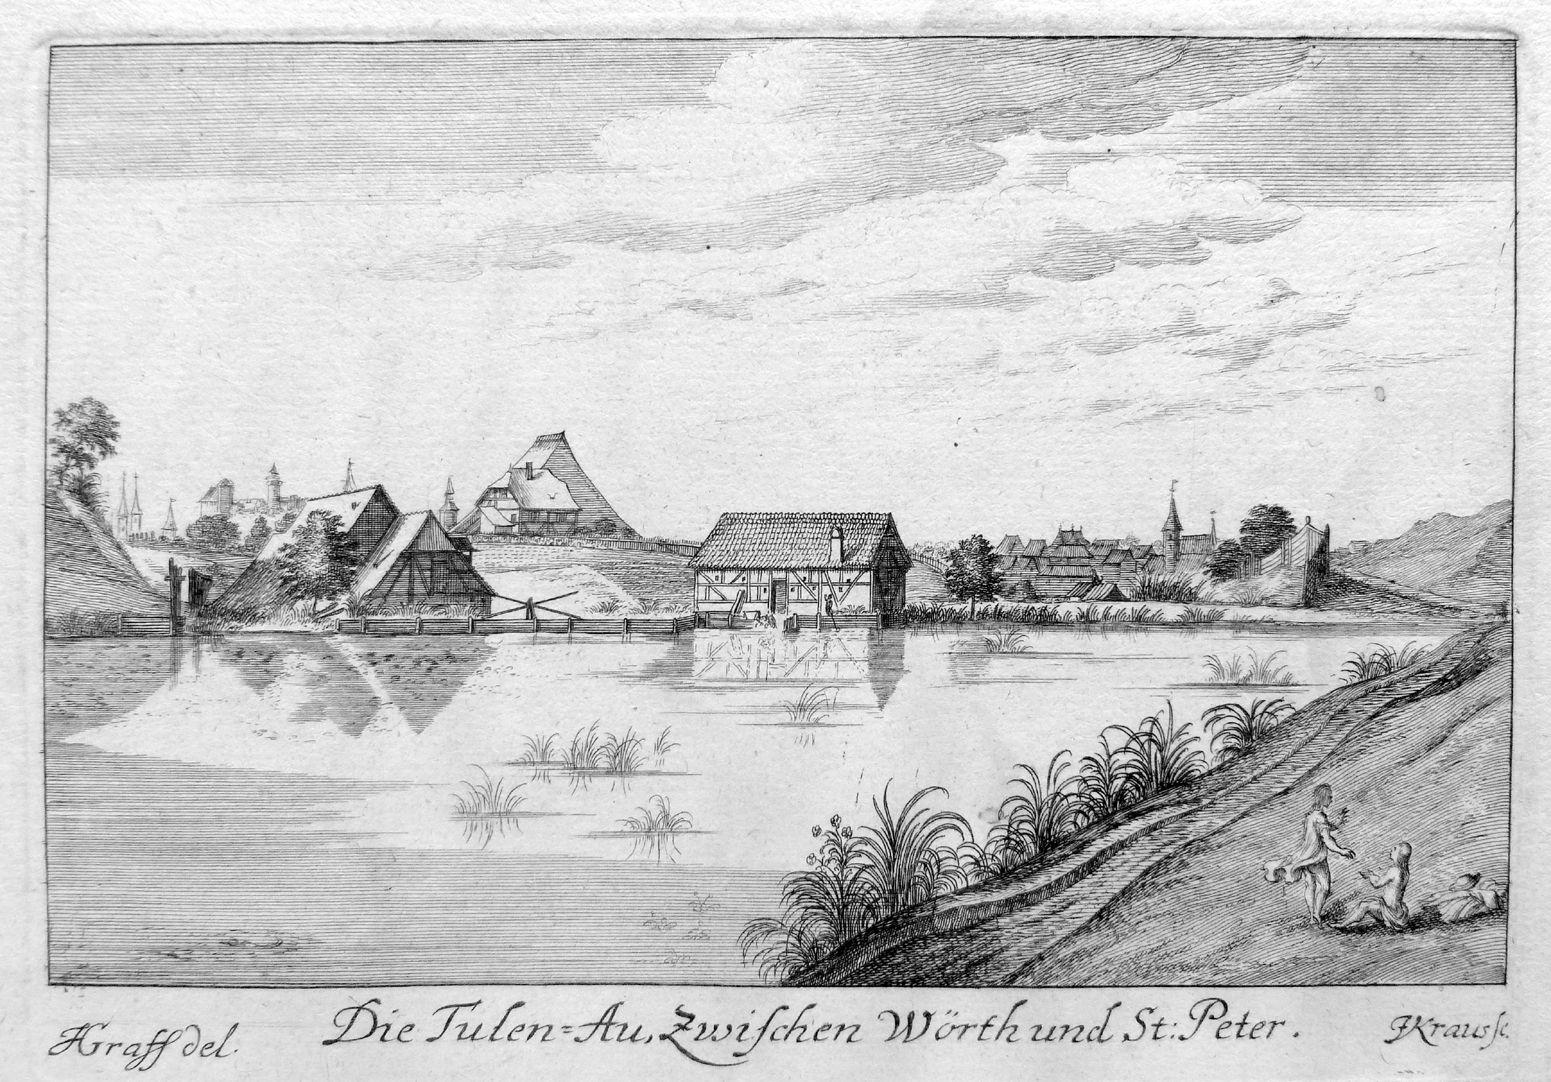 The Tulen-Au (Tullnau), between Wöhrd and St. Peter